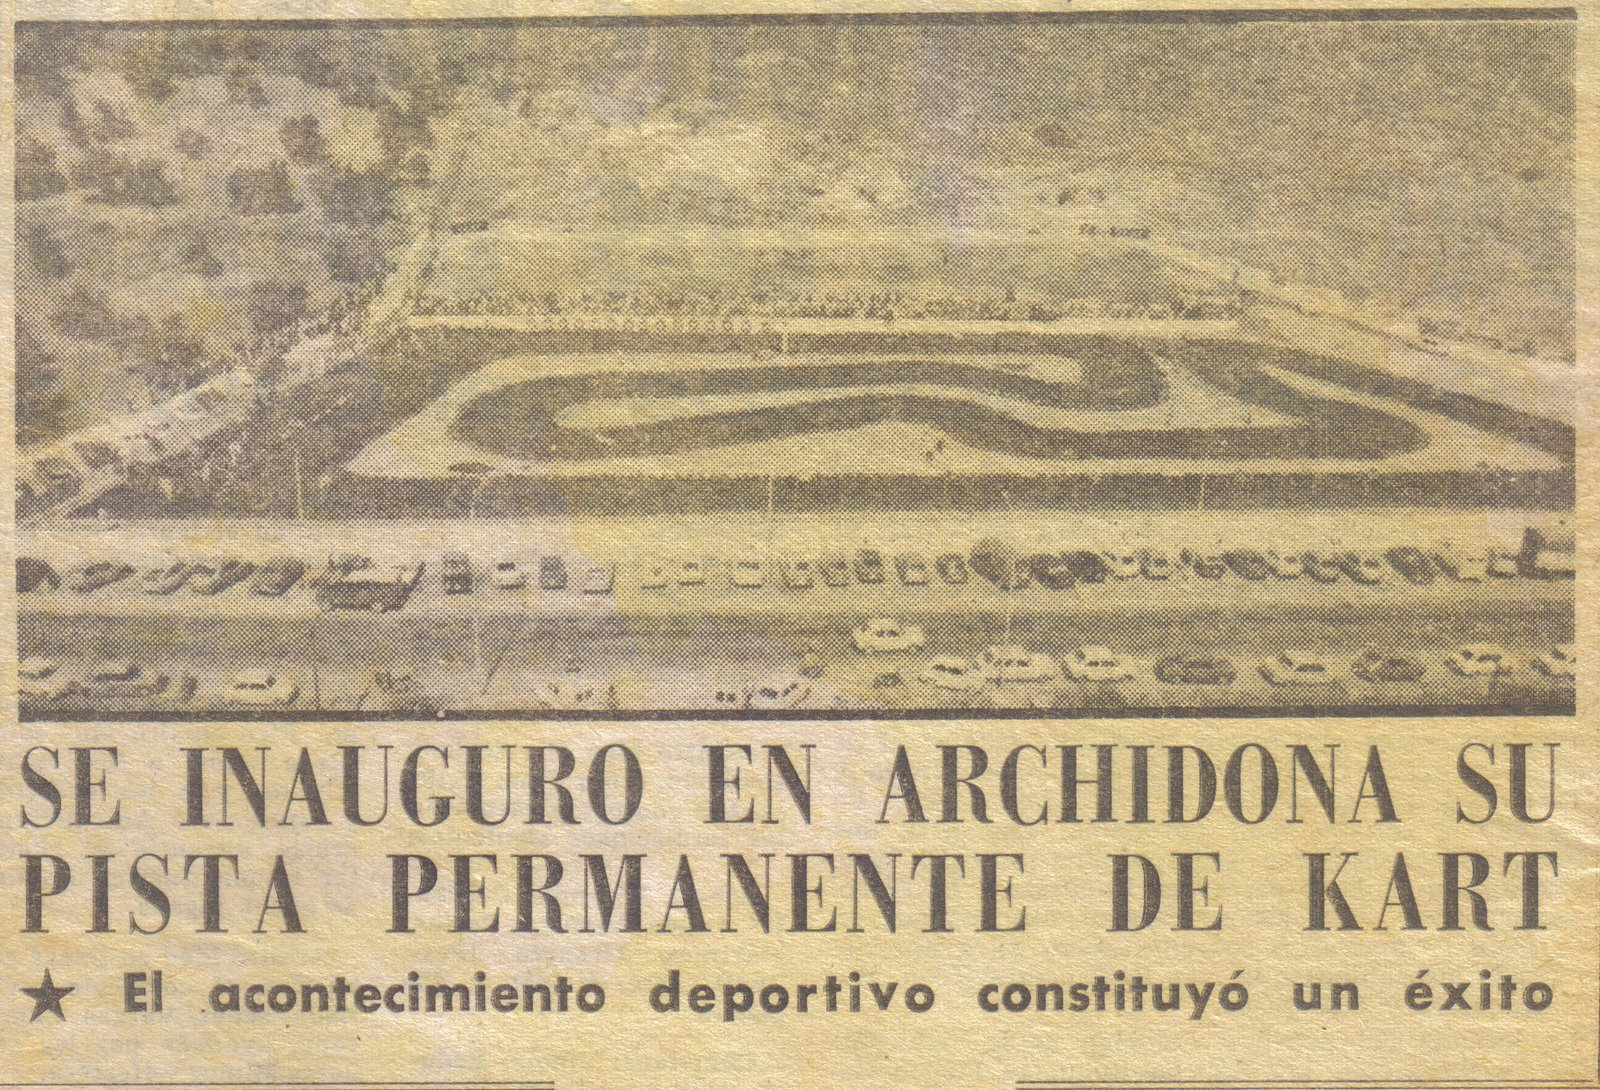 EL KARTING EN MALAGA | HISTORIA DEL AUTOMOVIL EN MALAGA